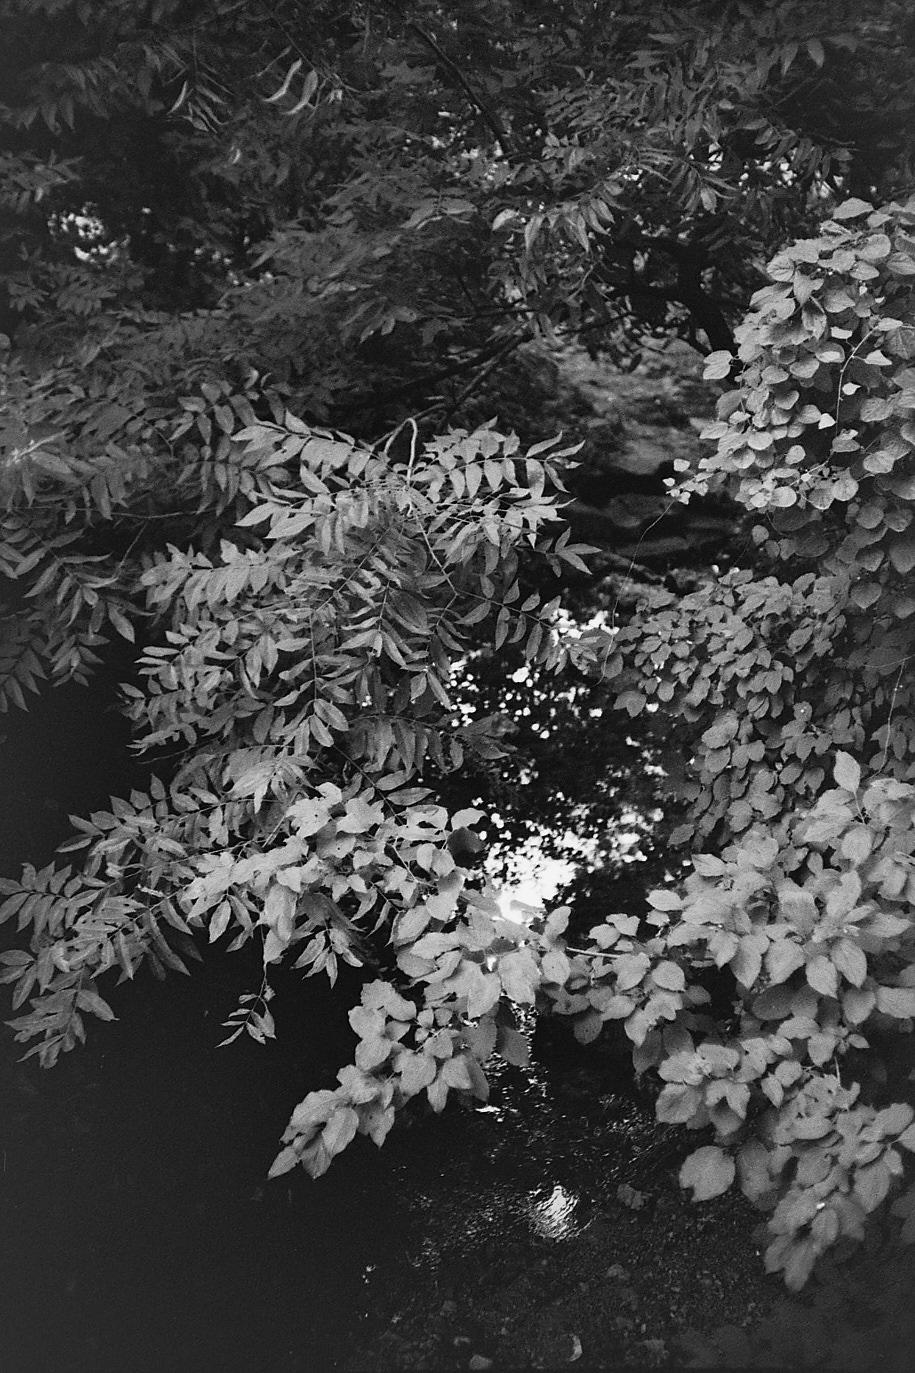 20160821 0939 Random FW Botanical Garden Random ©JamesECockroft 0215